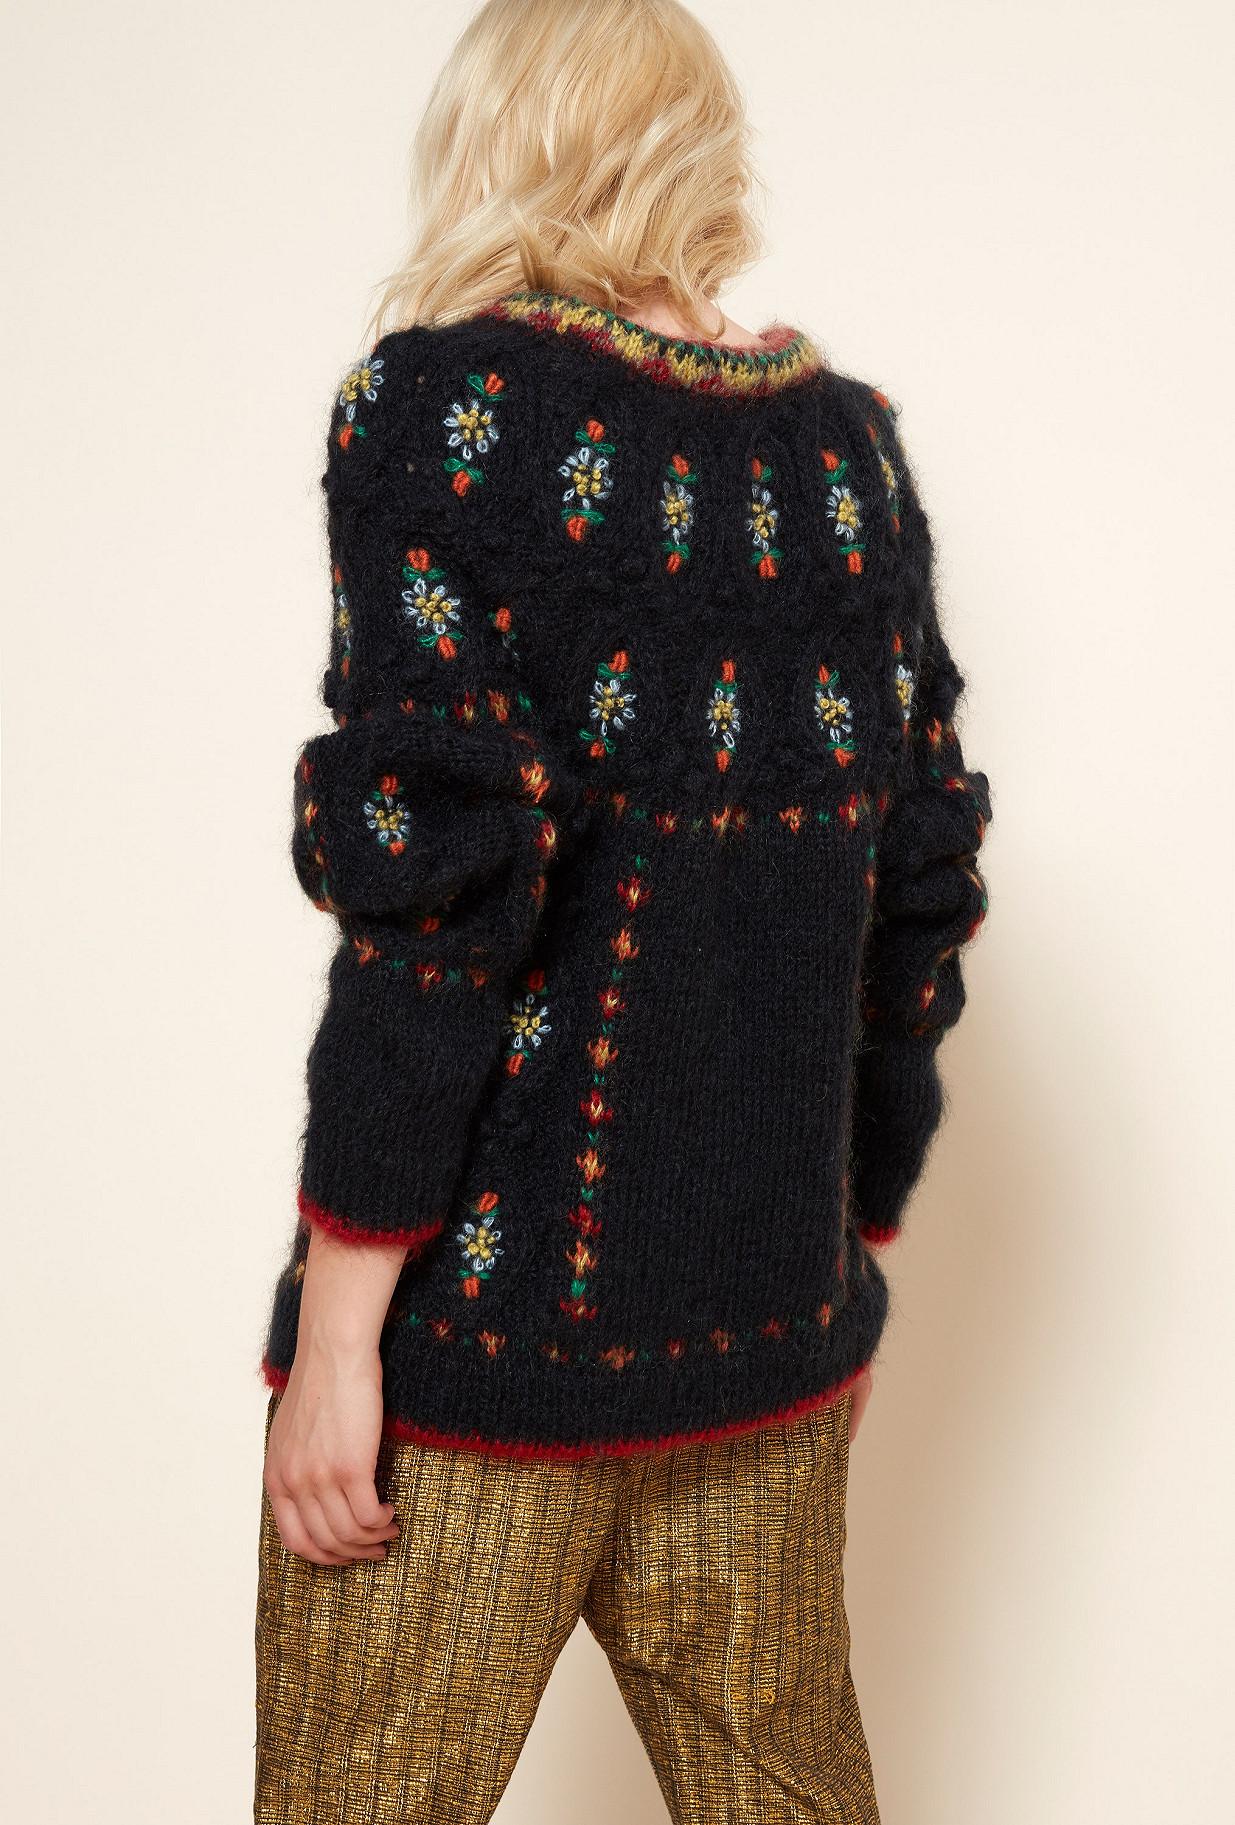 Black  Knit  Cheerleader Mes demoiselles fashion clothes designer Paris